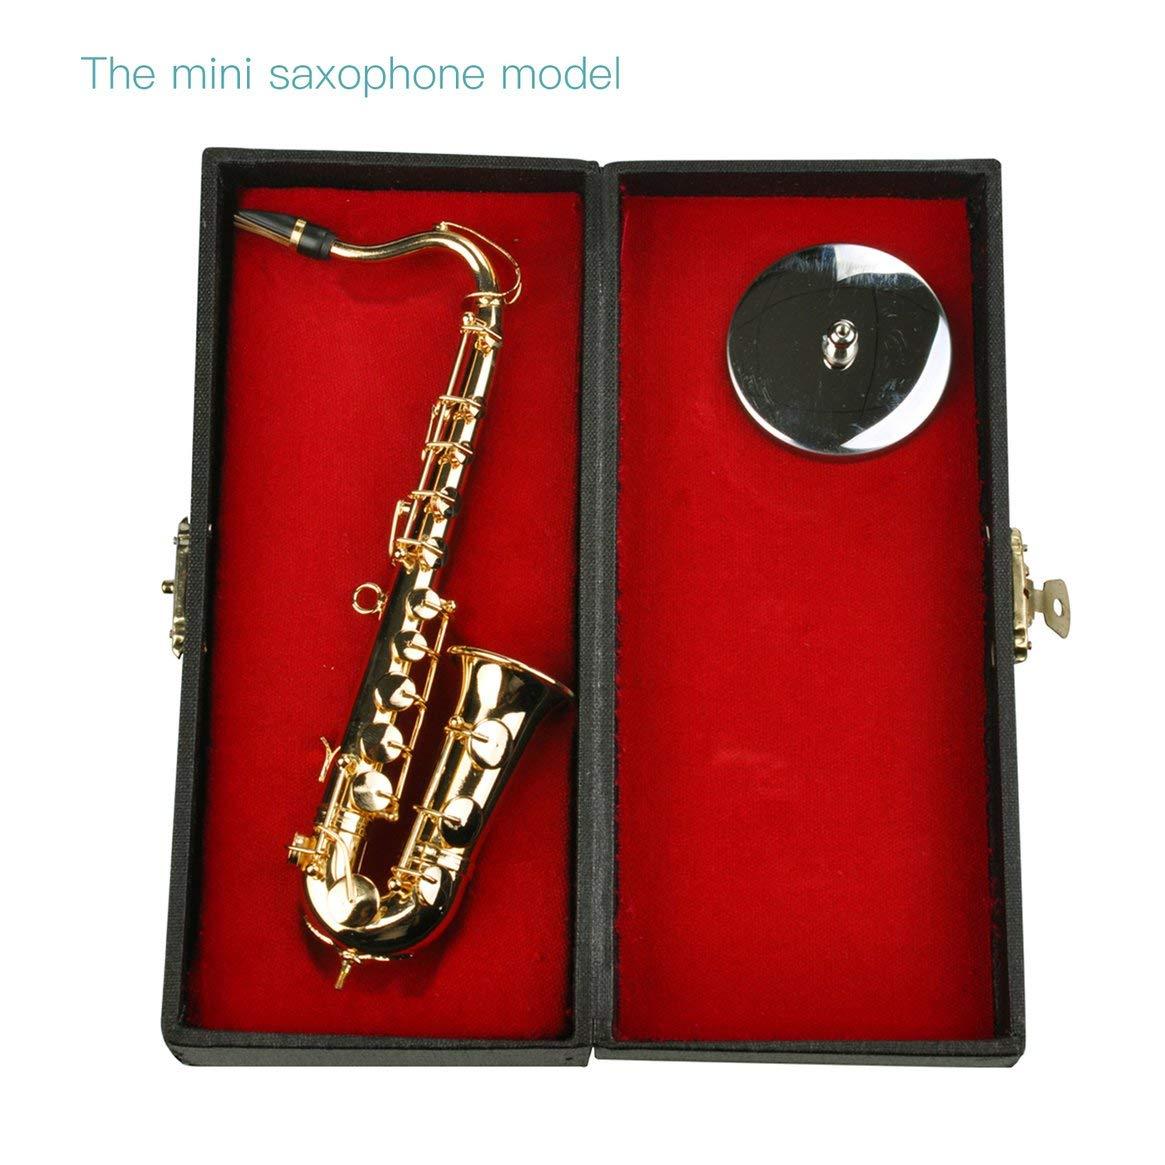 Instrumentos Musicales de Mini Saxofó n Goldplated Craft Modelo miniatura del saxofó n con el soporte de metal para la decoració n del hogar Delicacydex